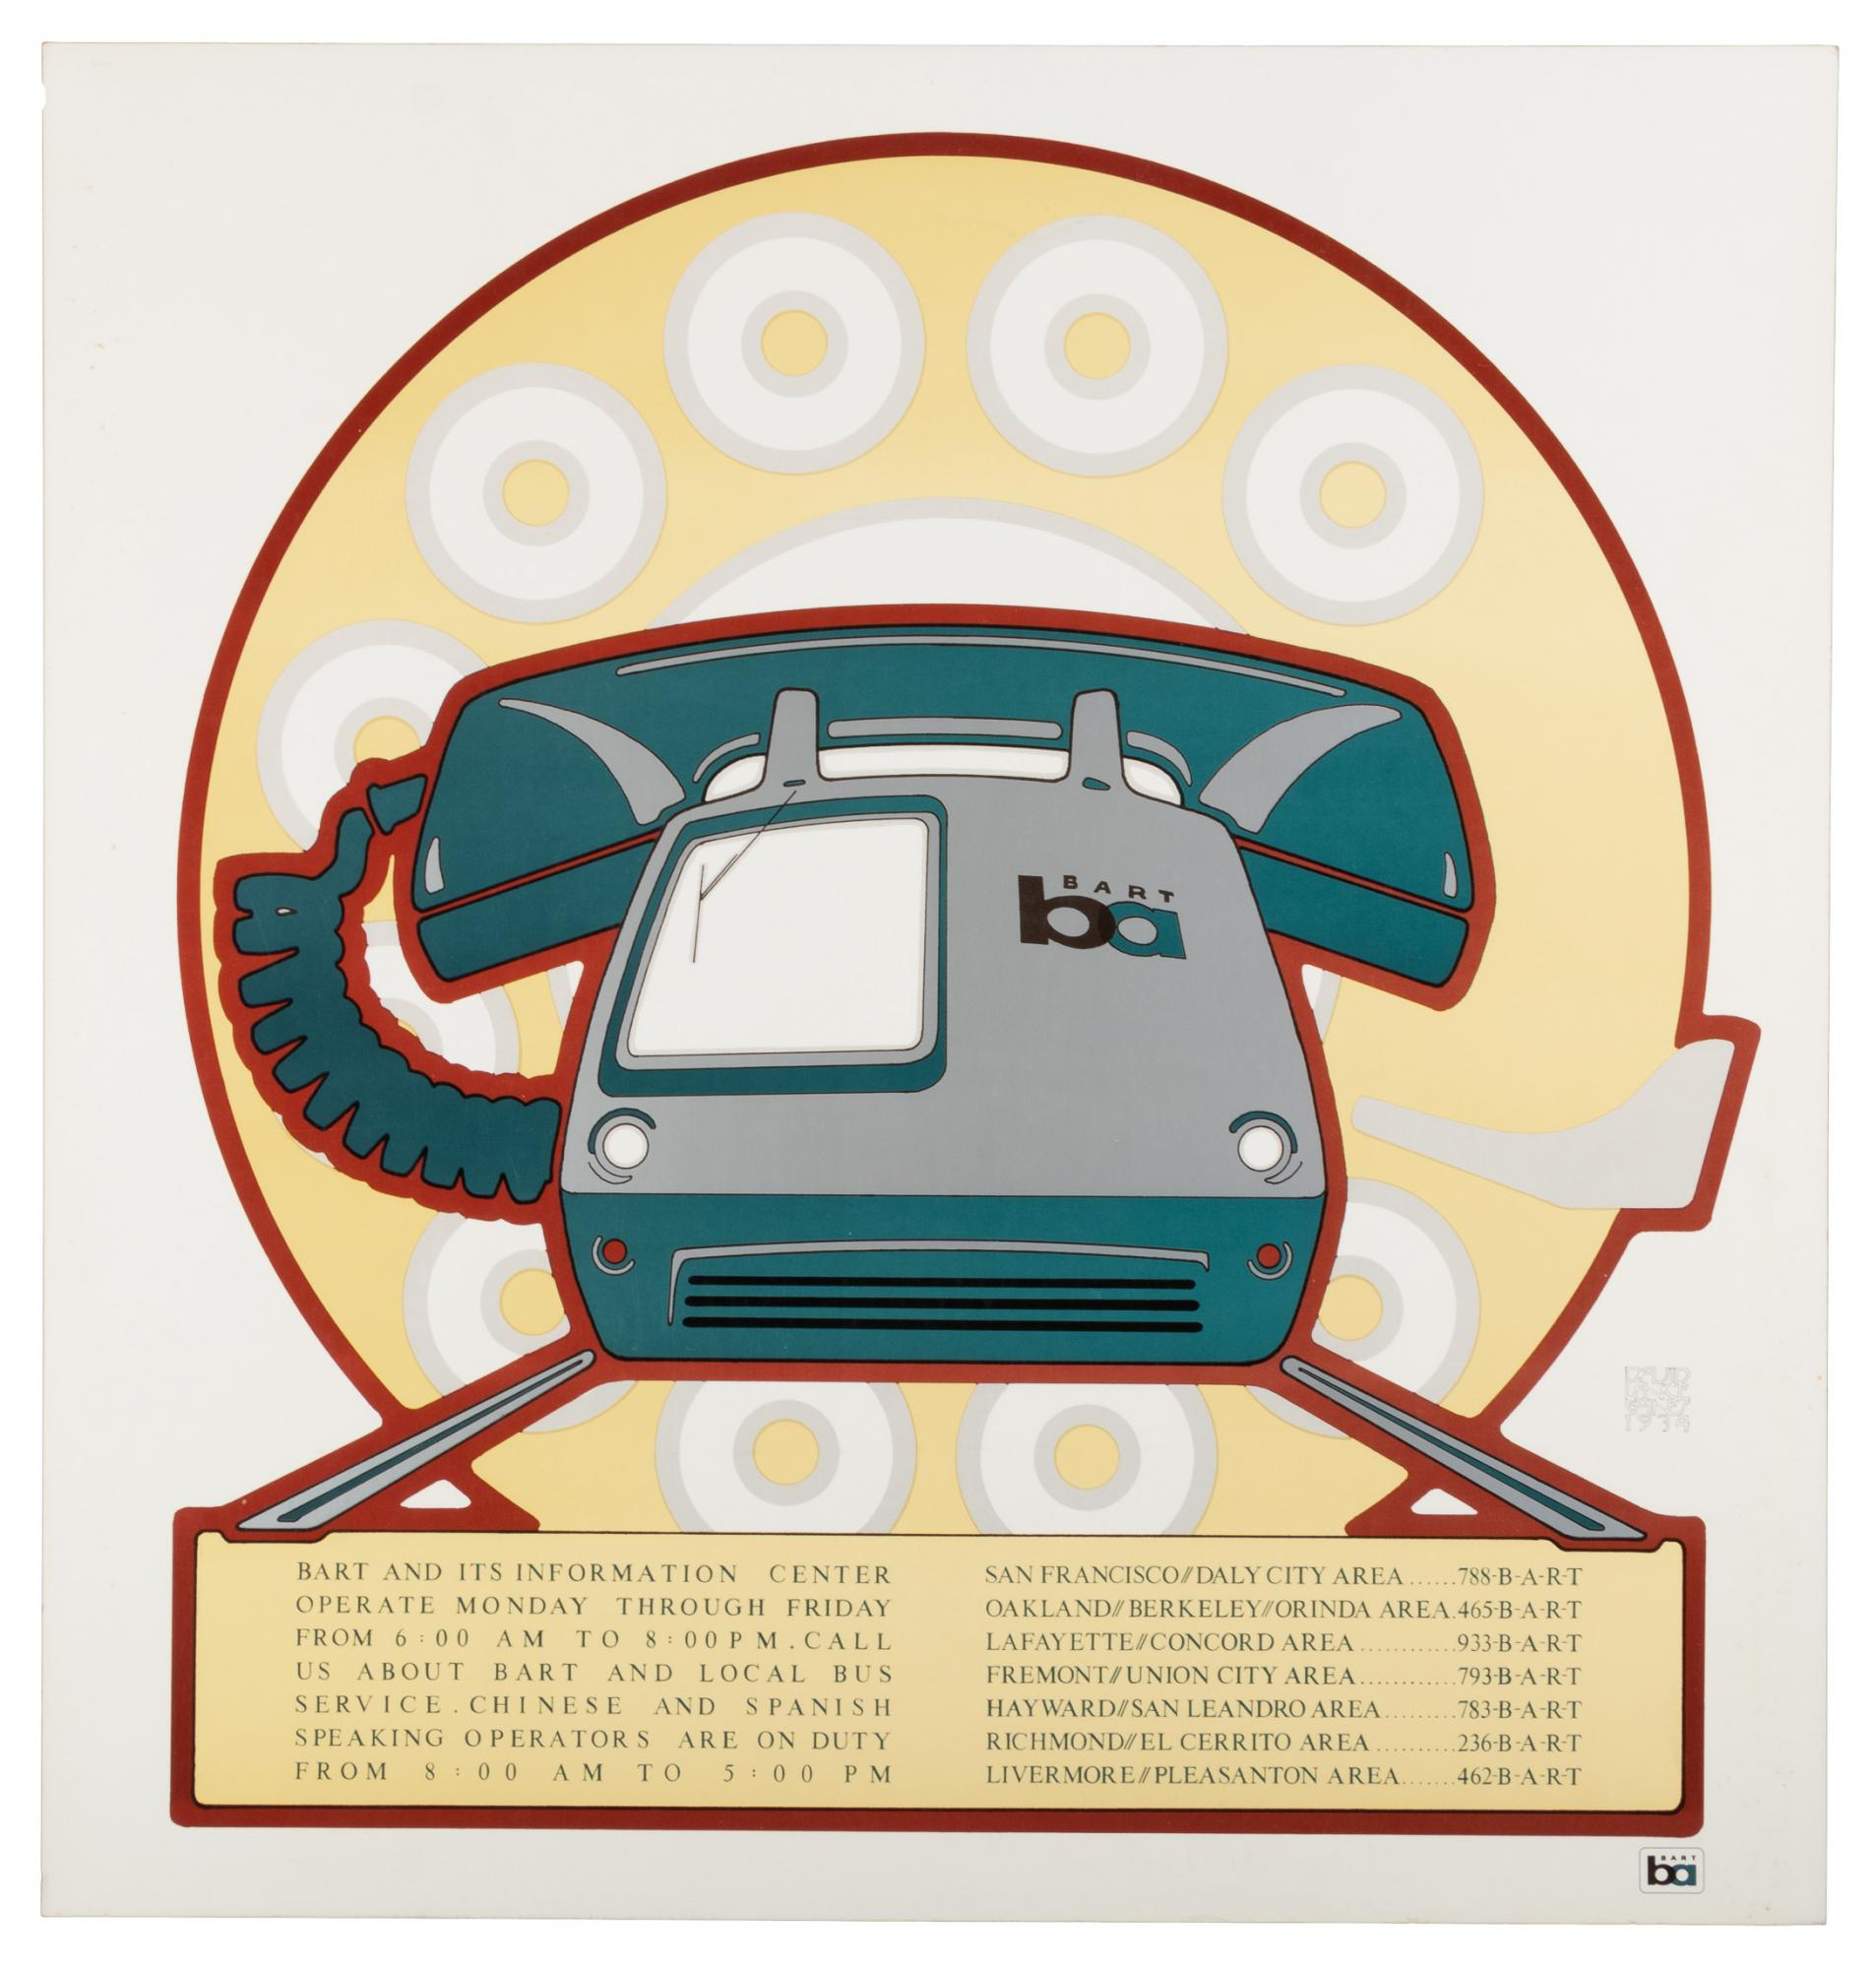 David Lance Goines' BART poster